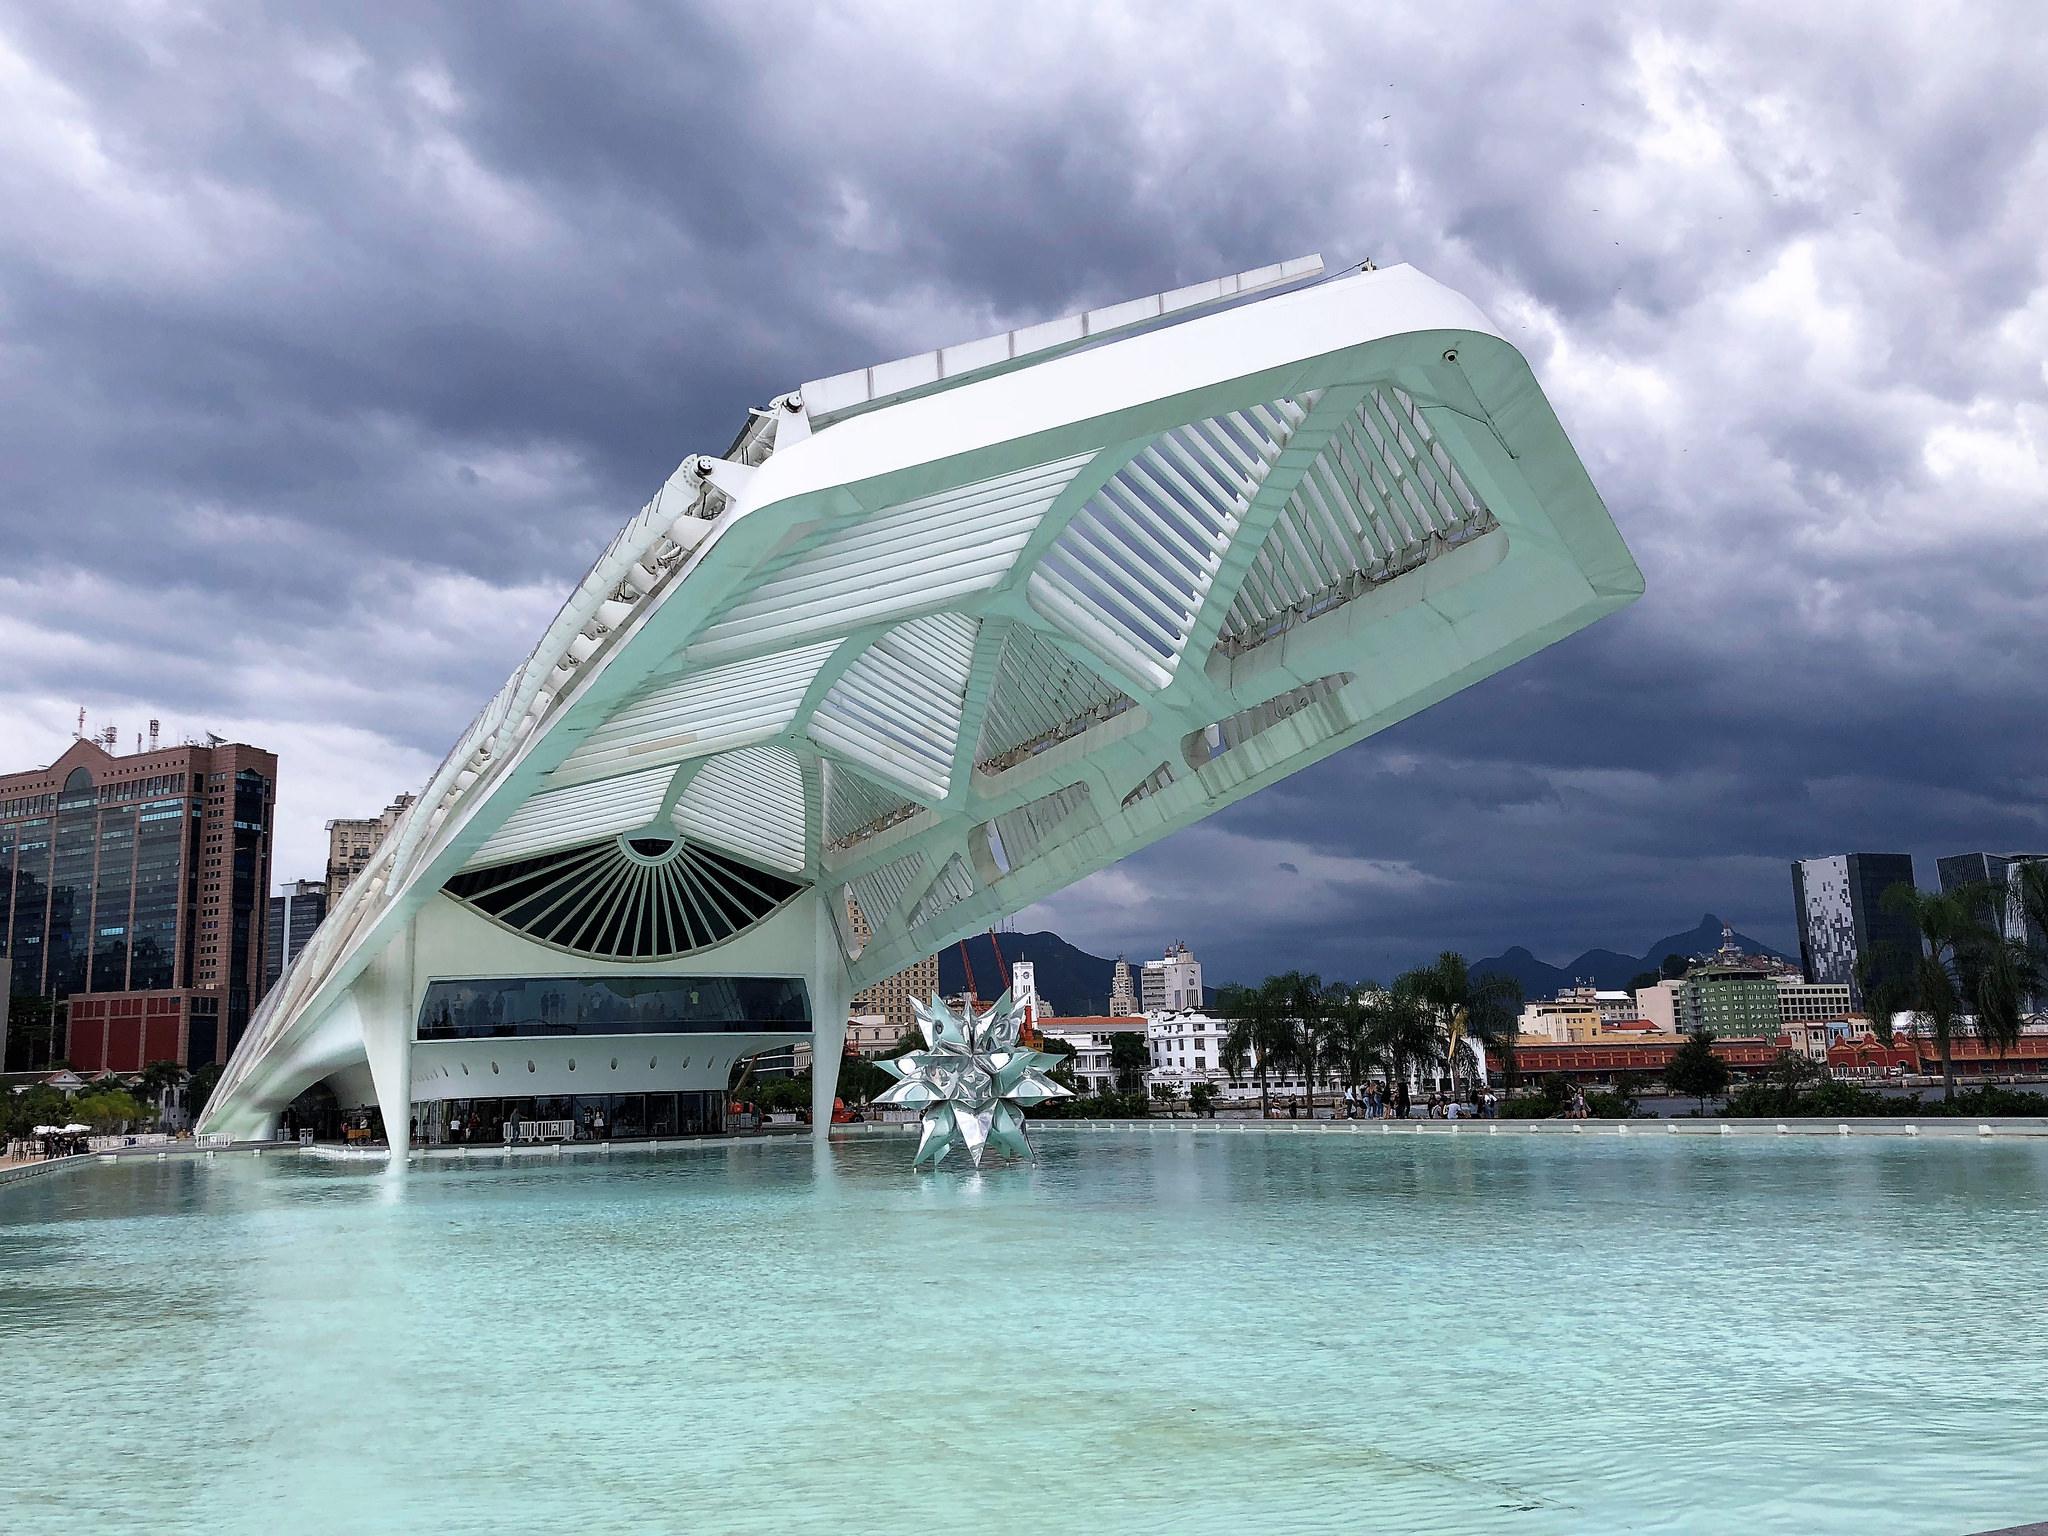 HIGH-TECH ARCHITECTURE. El museo del mañana de Brasil.